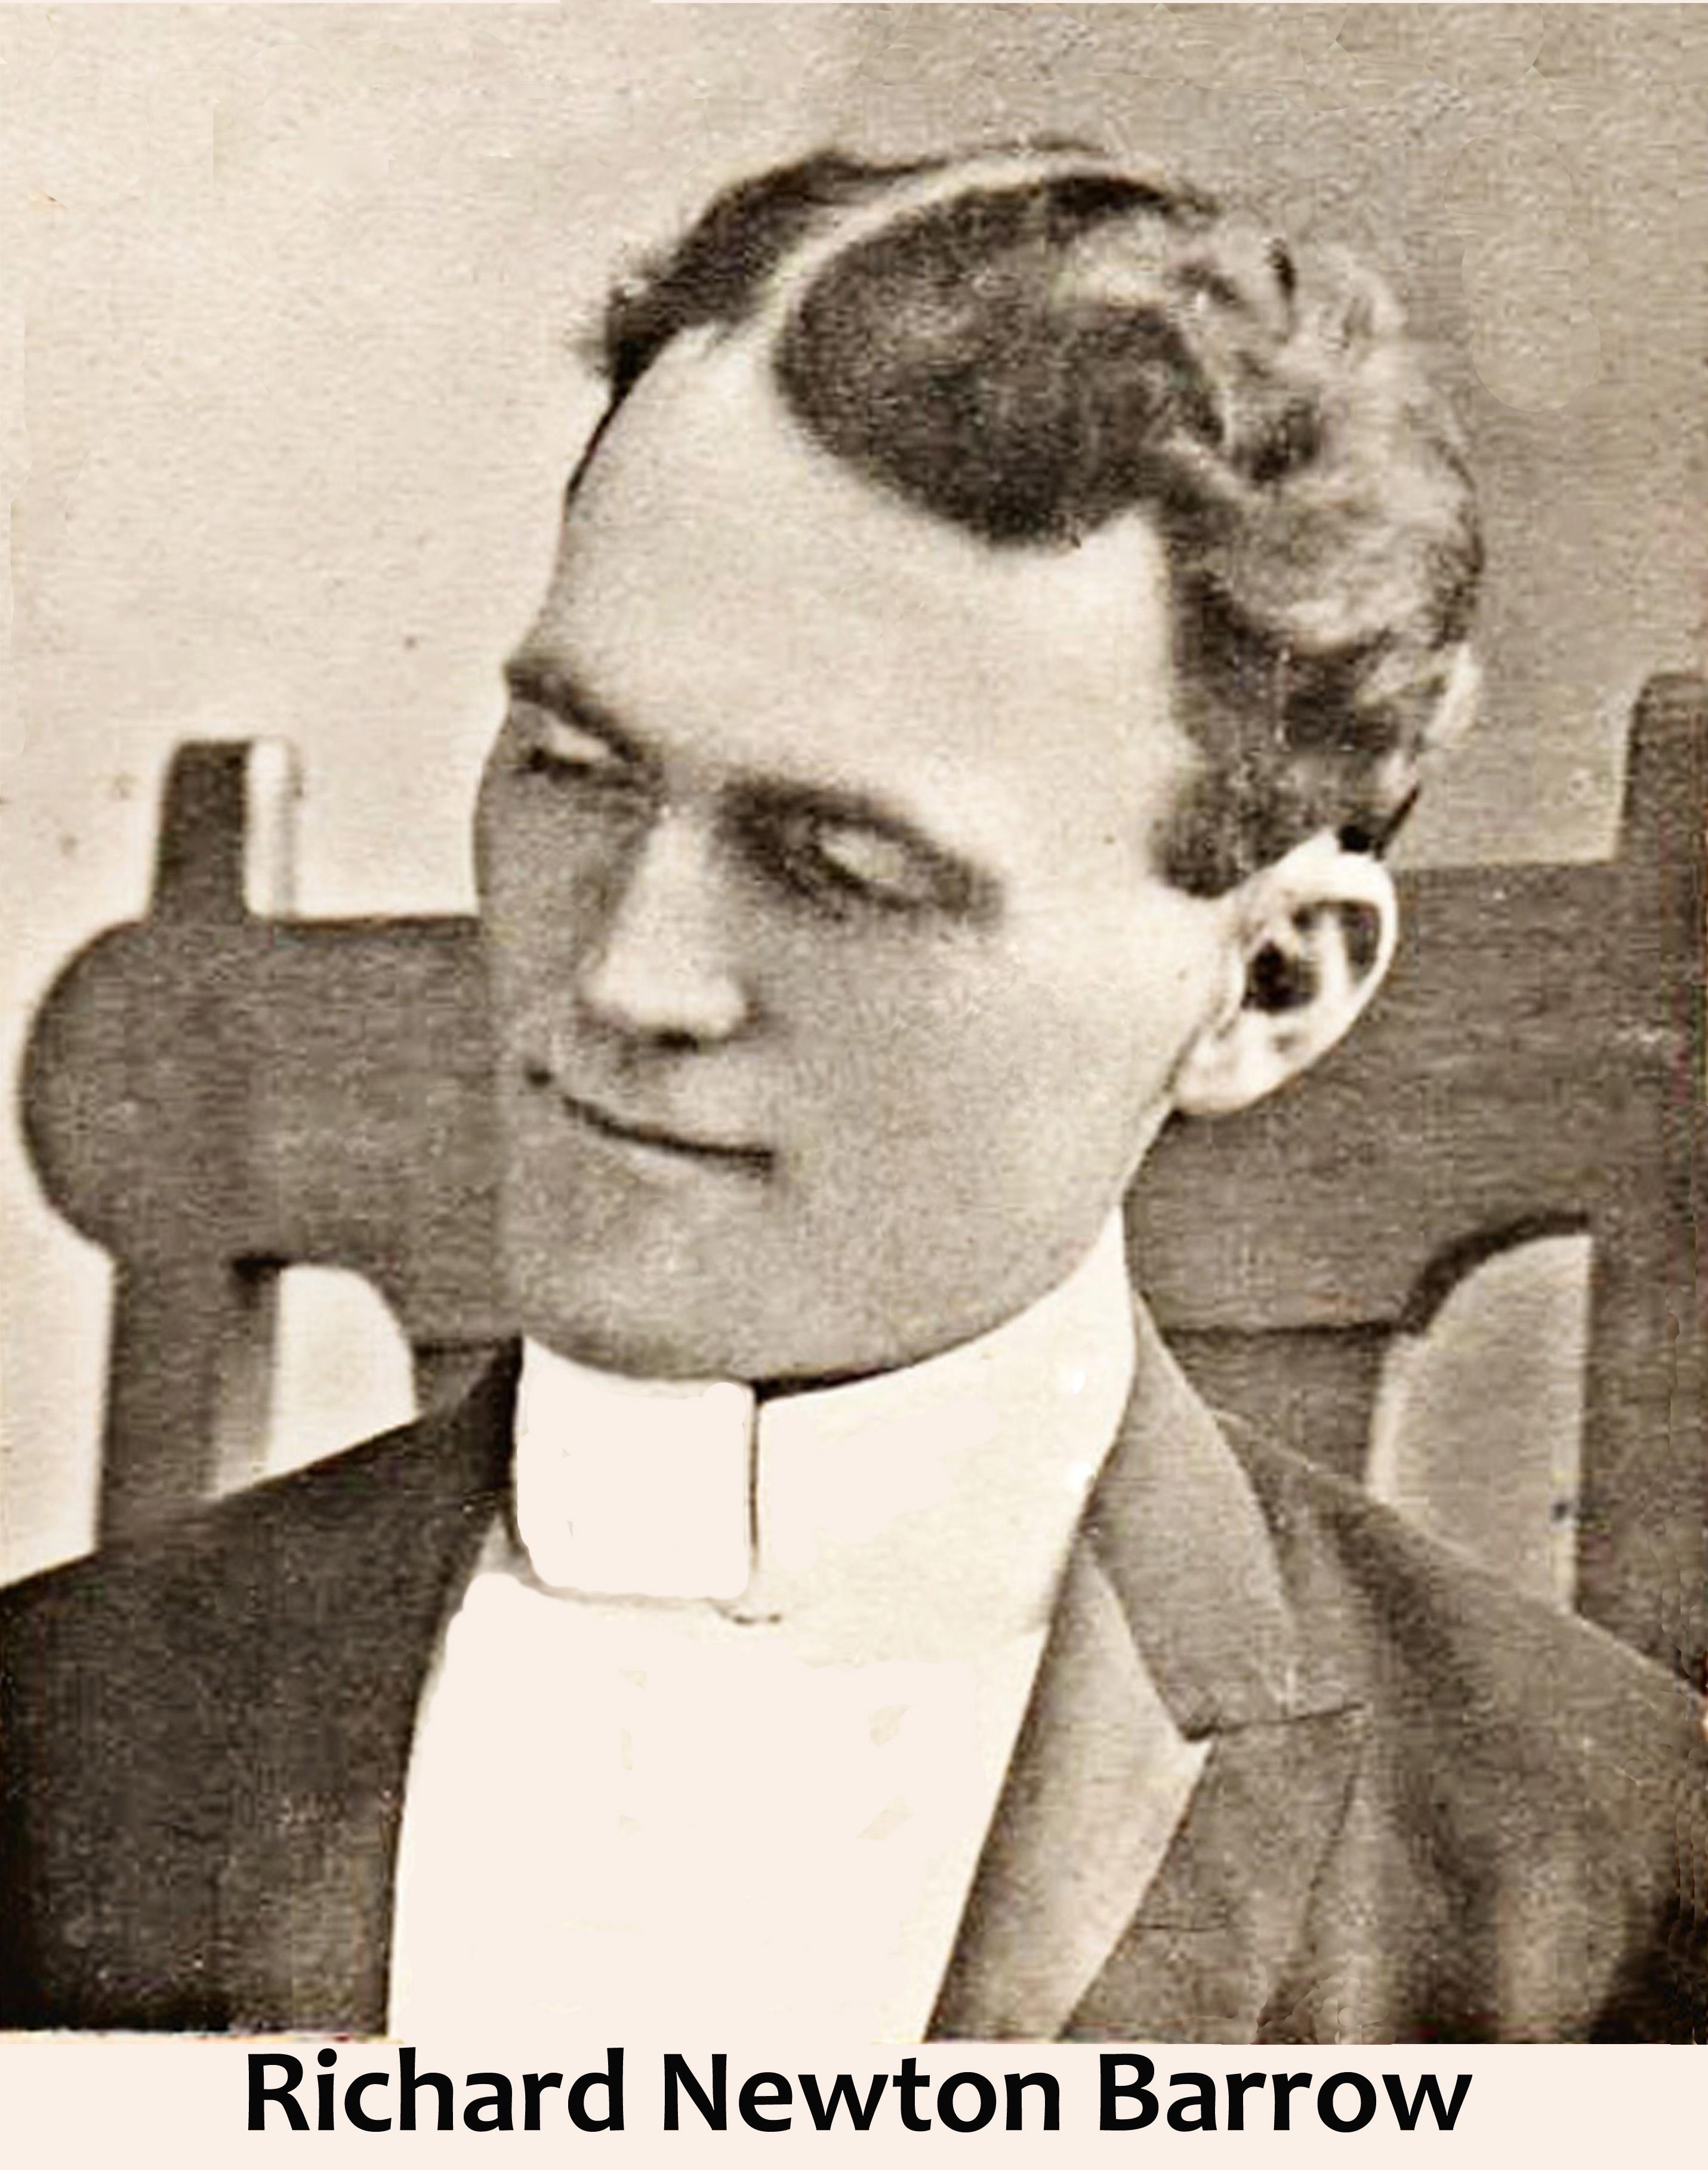 Richard Newton Barrow